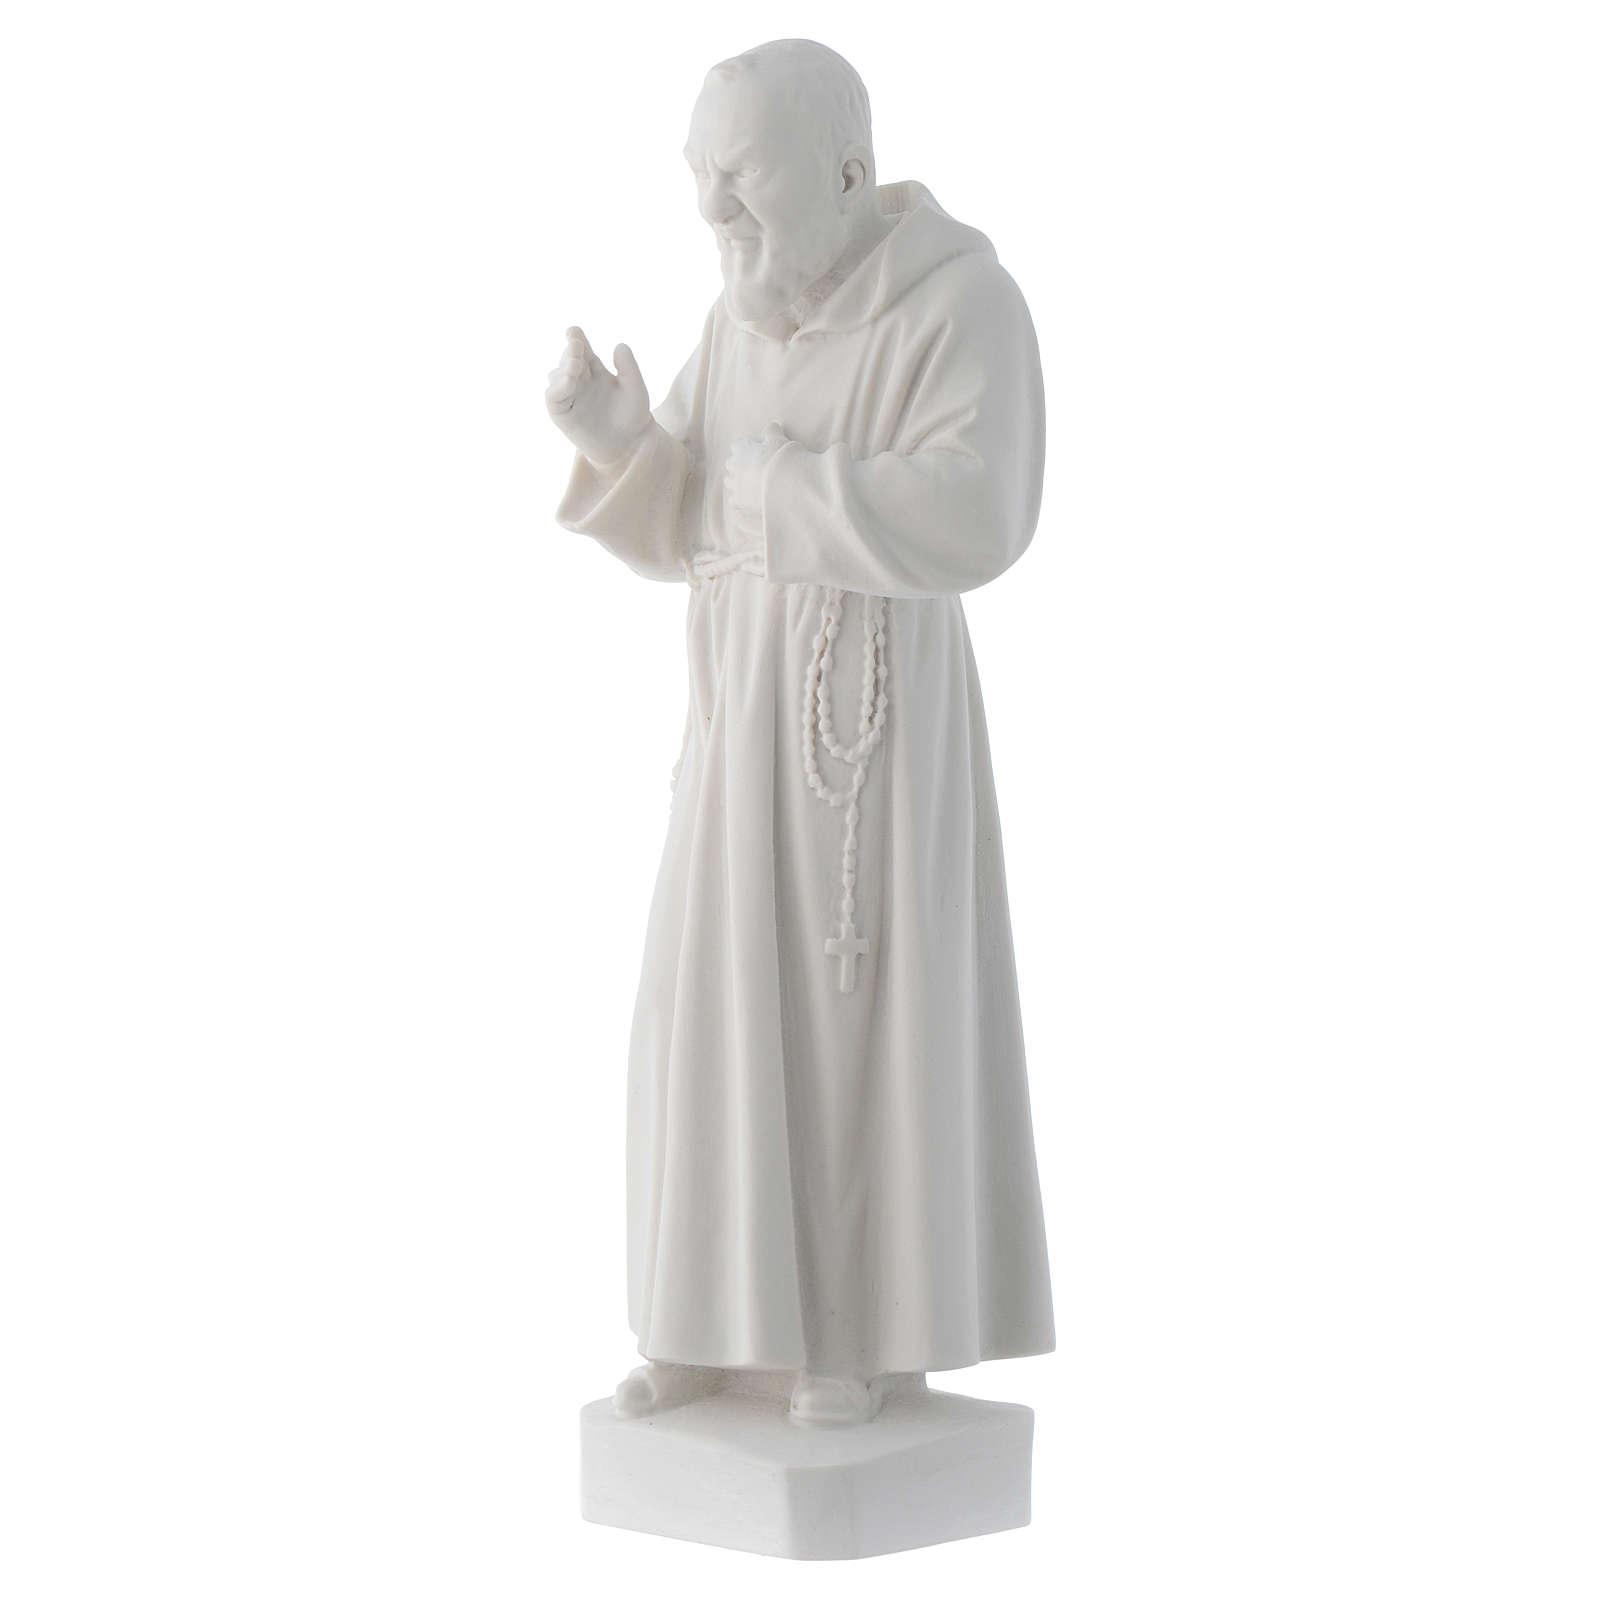 Padre Pio statue, 30 cm in white marble dust 4